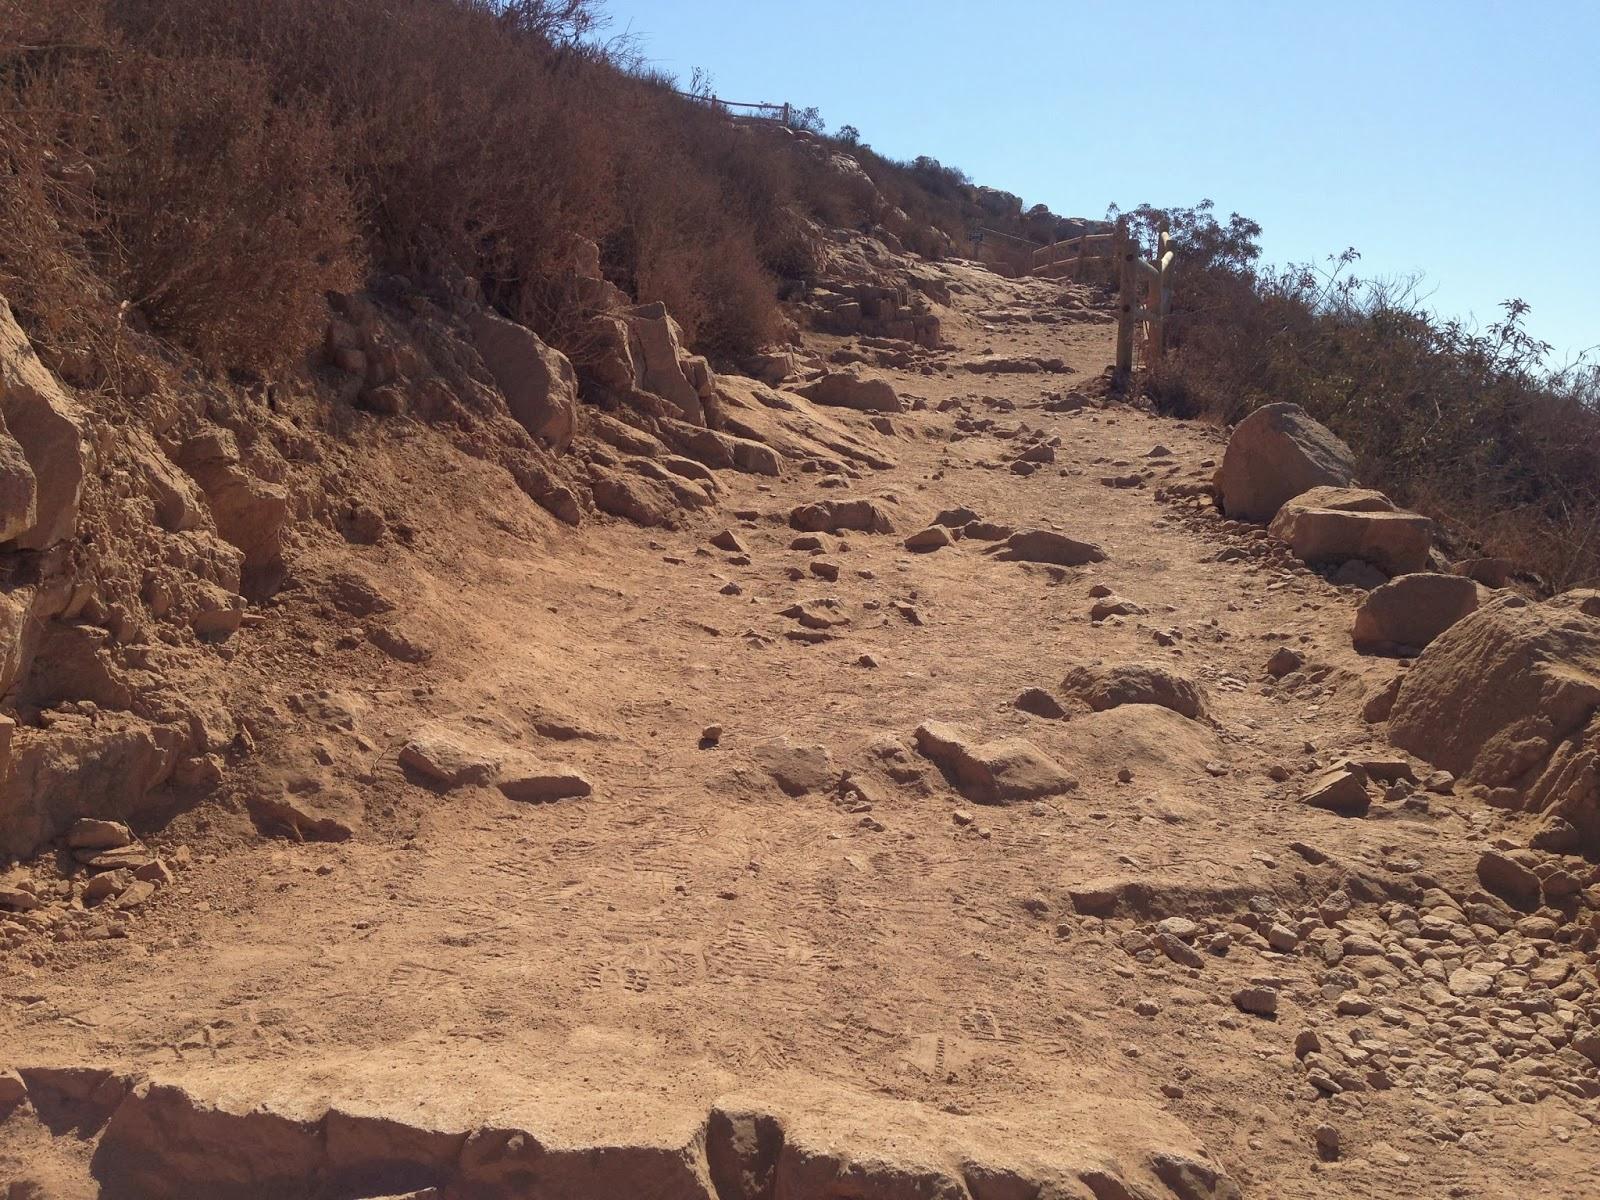 Cowles Mountain - San Diego Hiking Trail - Go Hike It